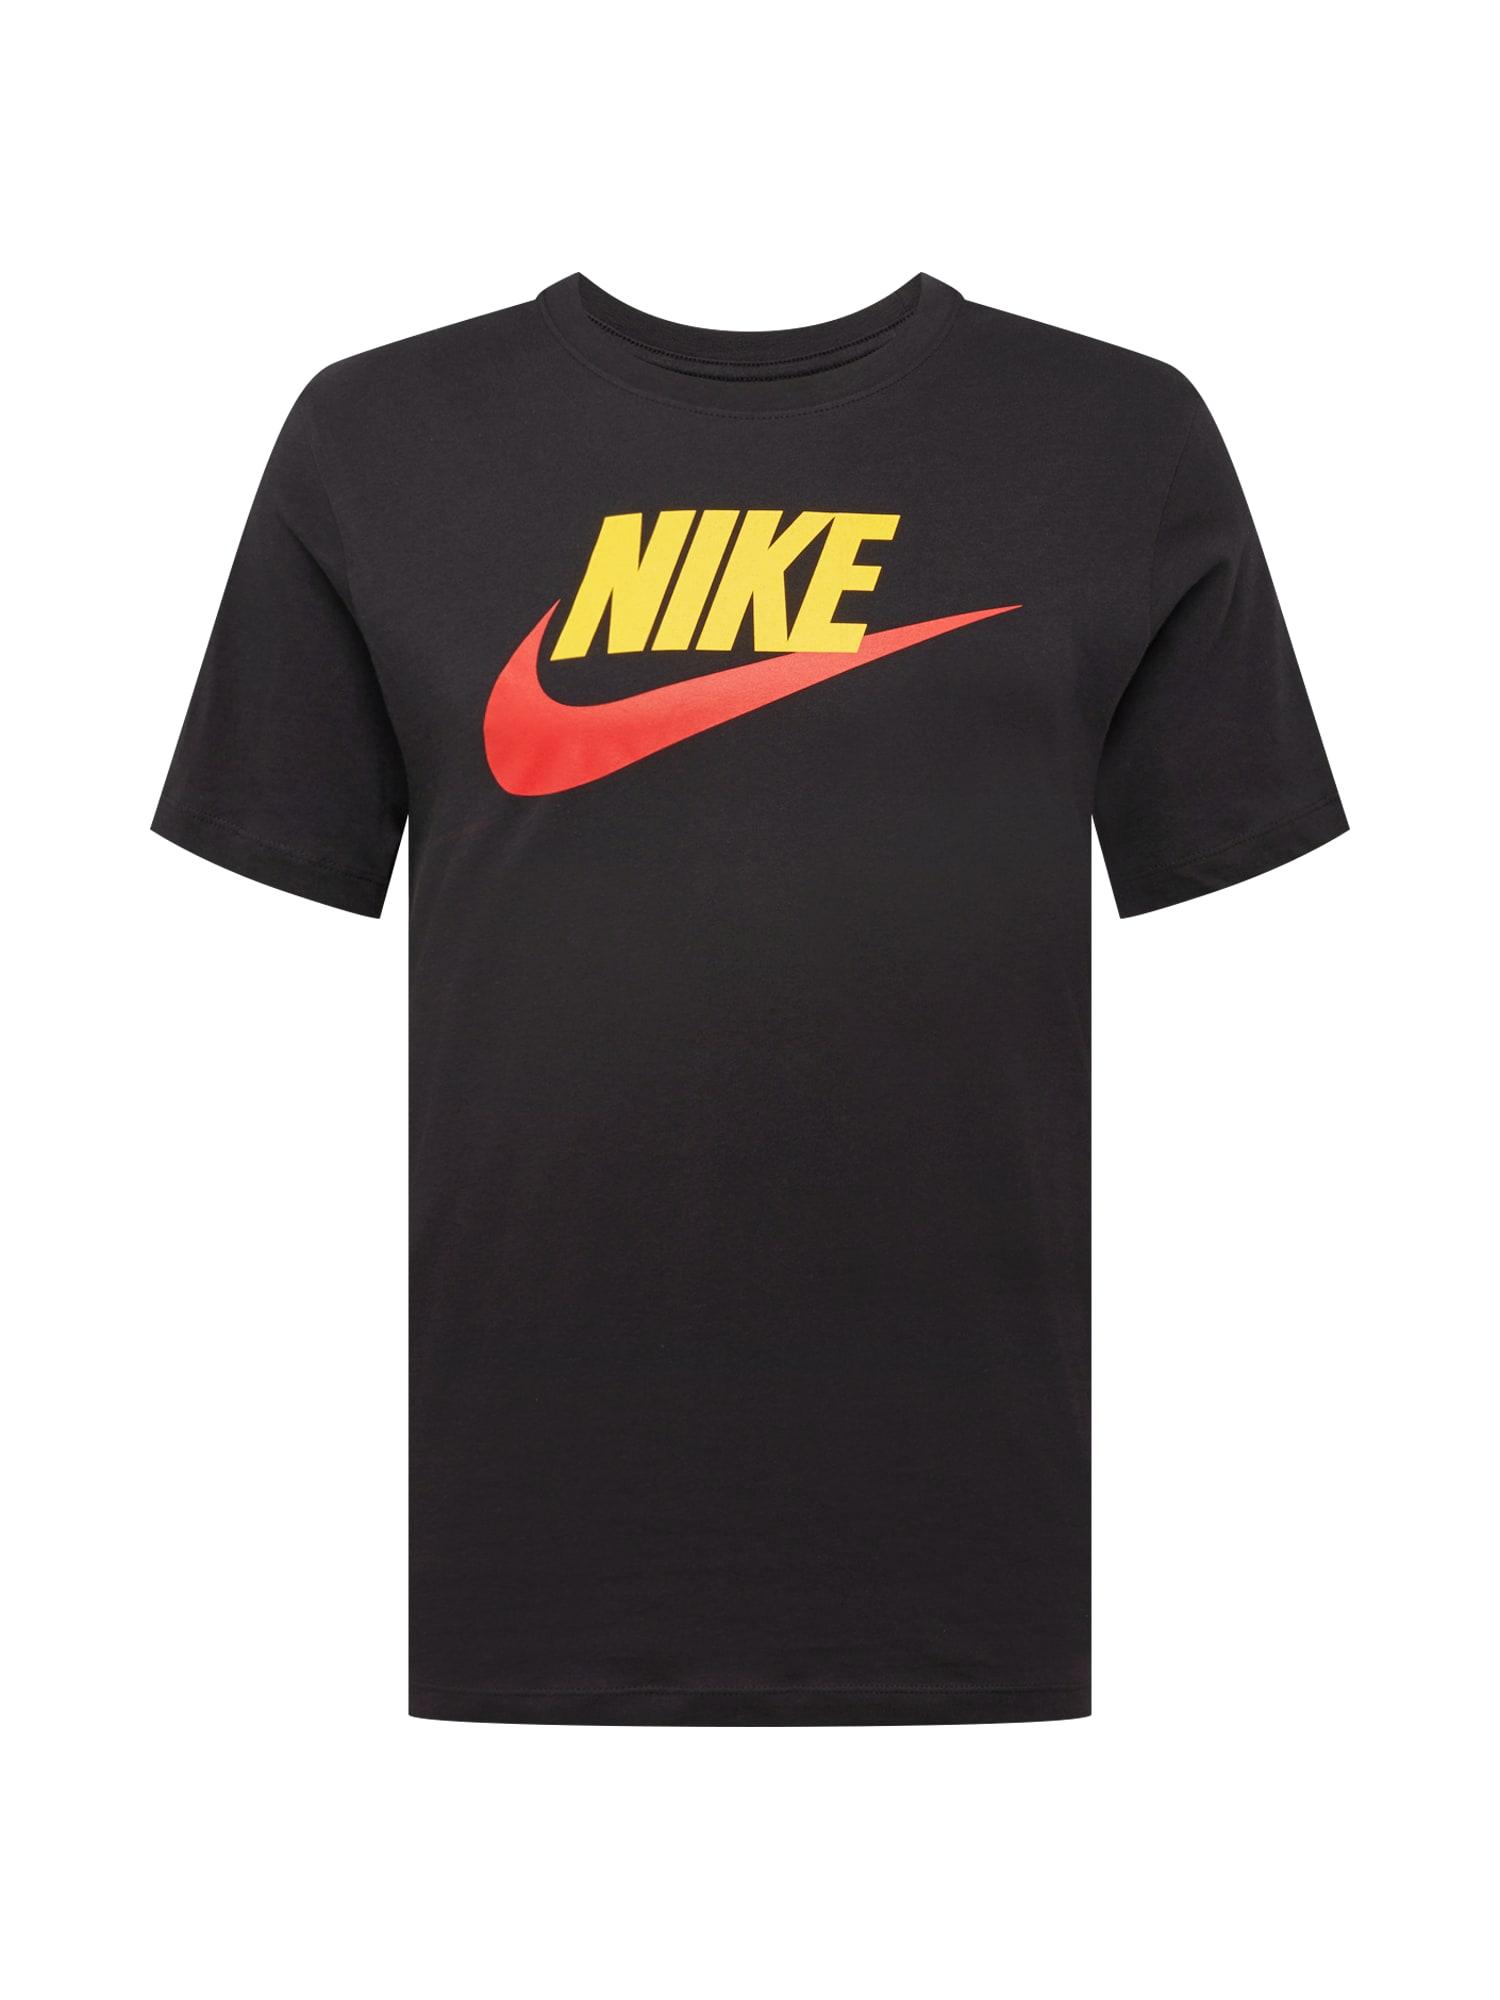 Tričko žlutá červená černá Nike Sportswear